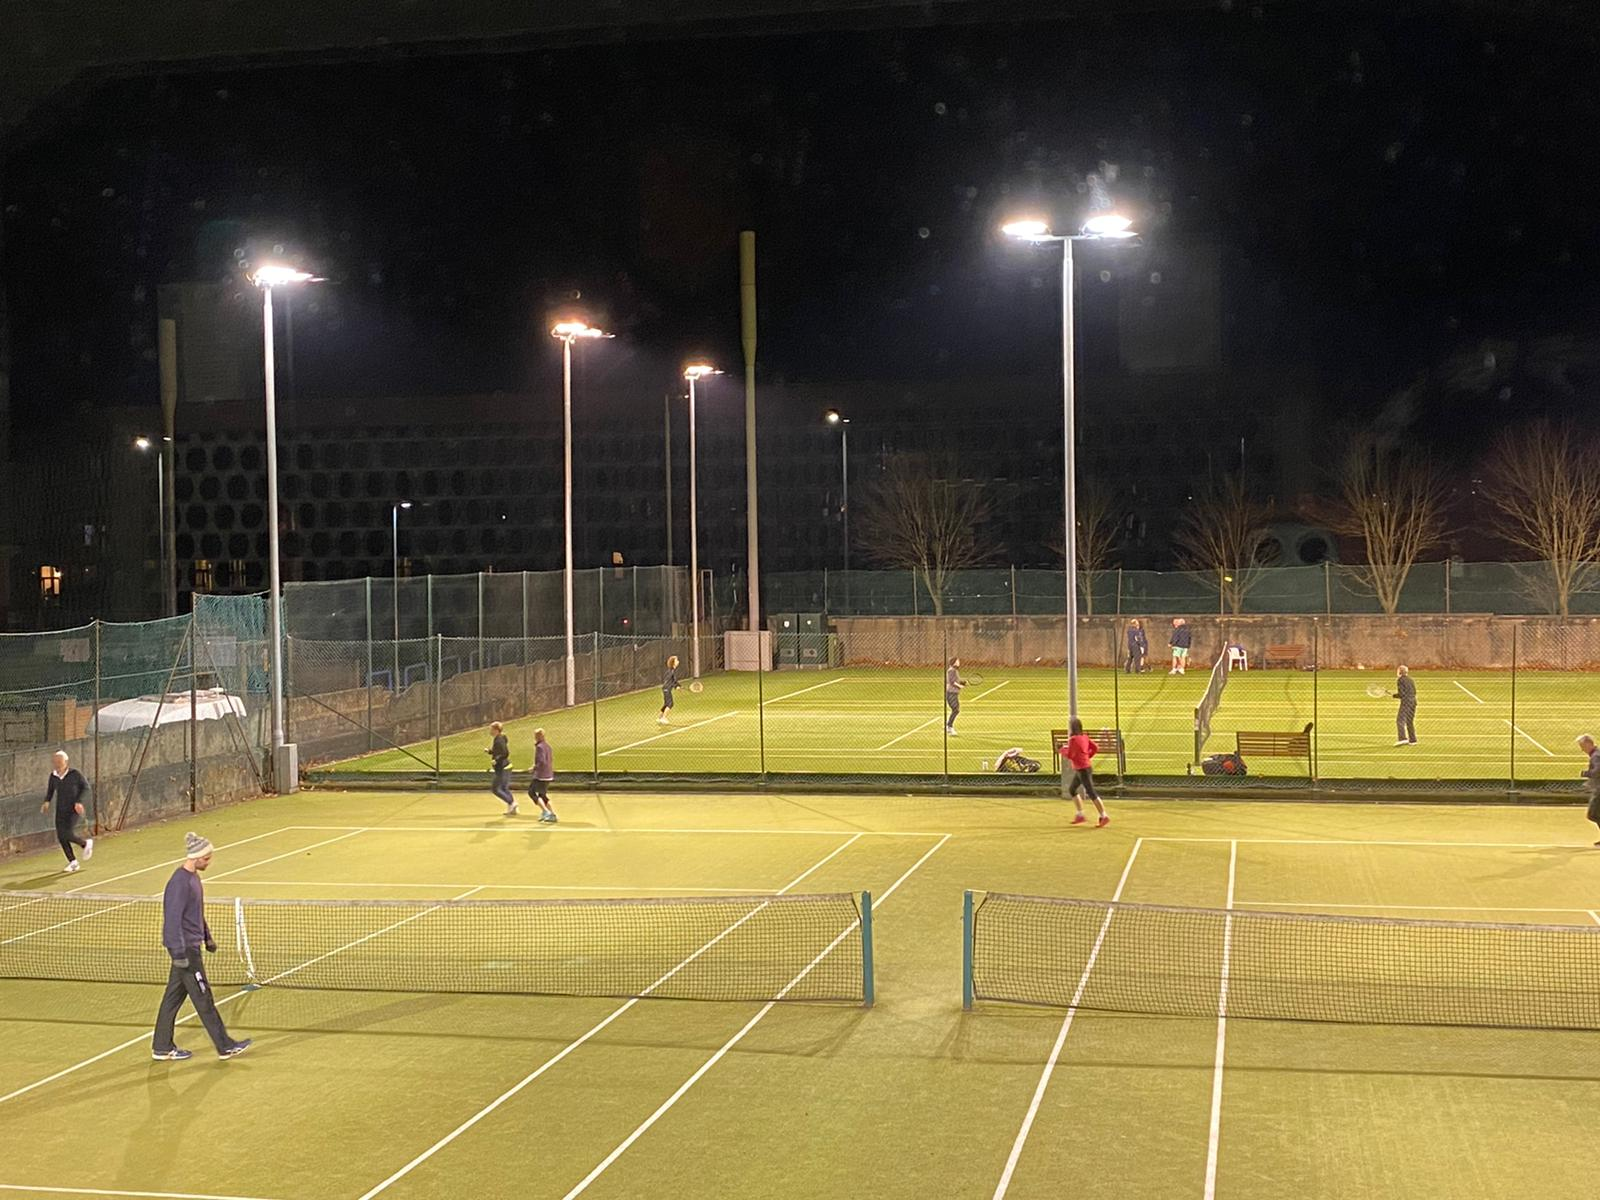 Broomhill Lawn Tennis & Squash Club